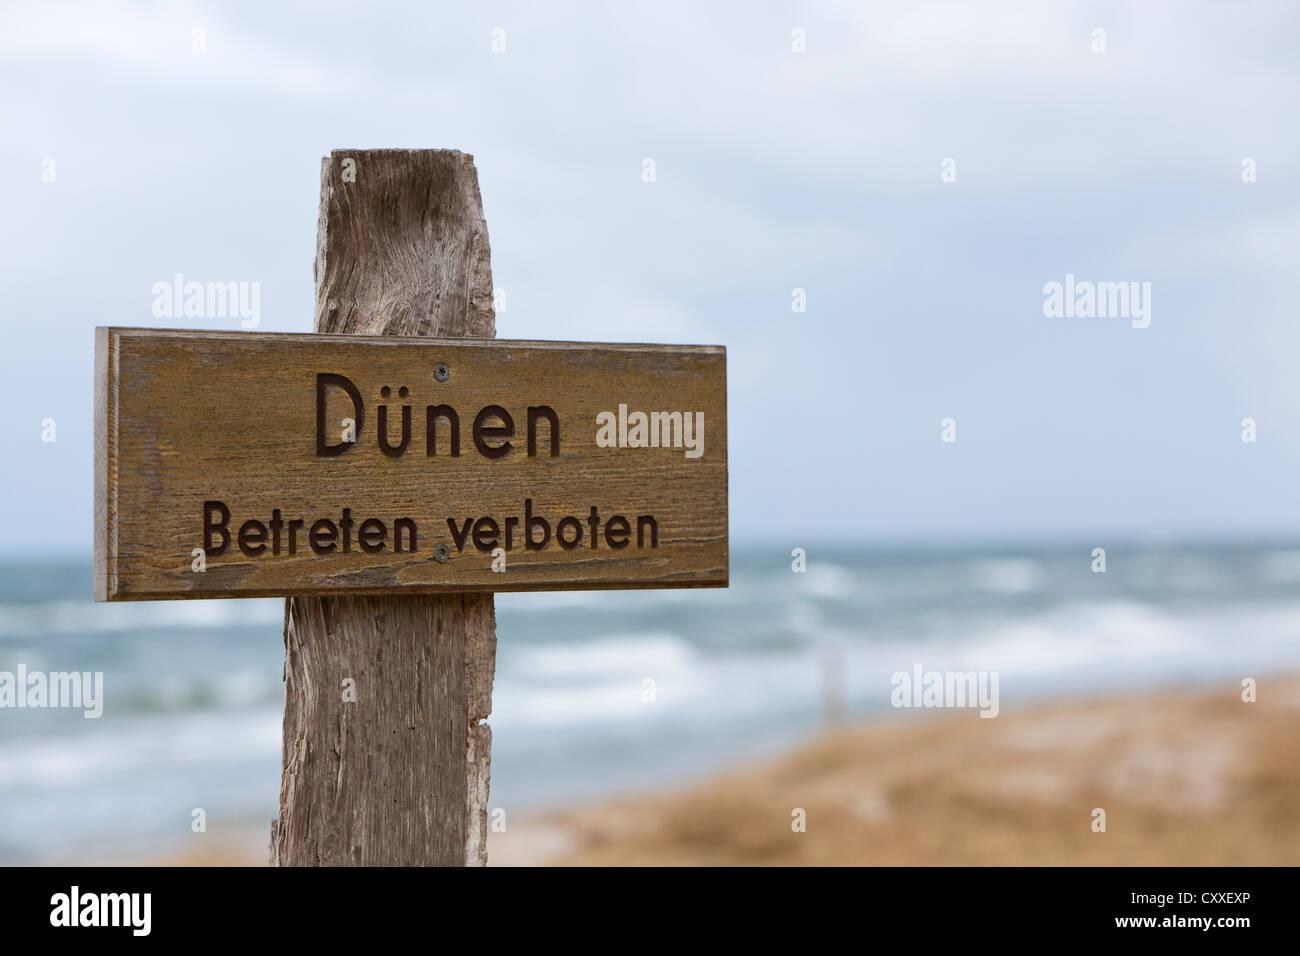 Wooden cross, prohibition sign, no entry sign, 'Duenen betreten verboten', German for 'dunes, do not - Stock Image